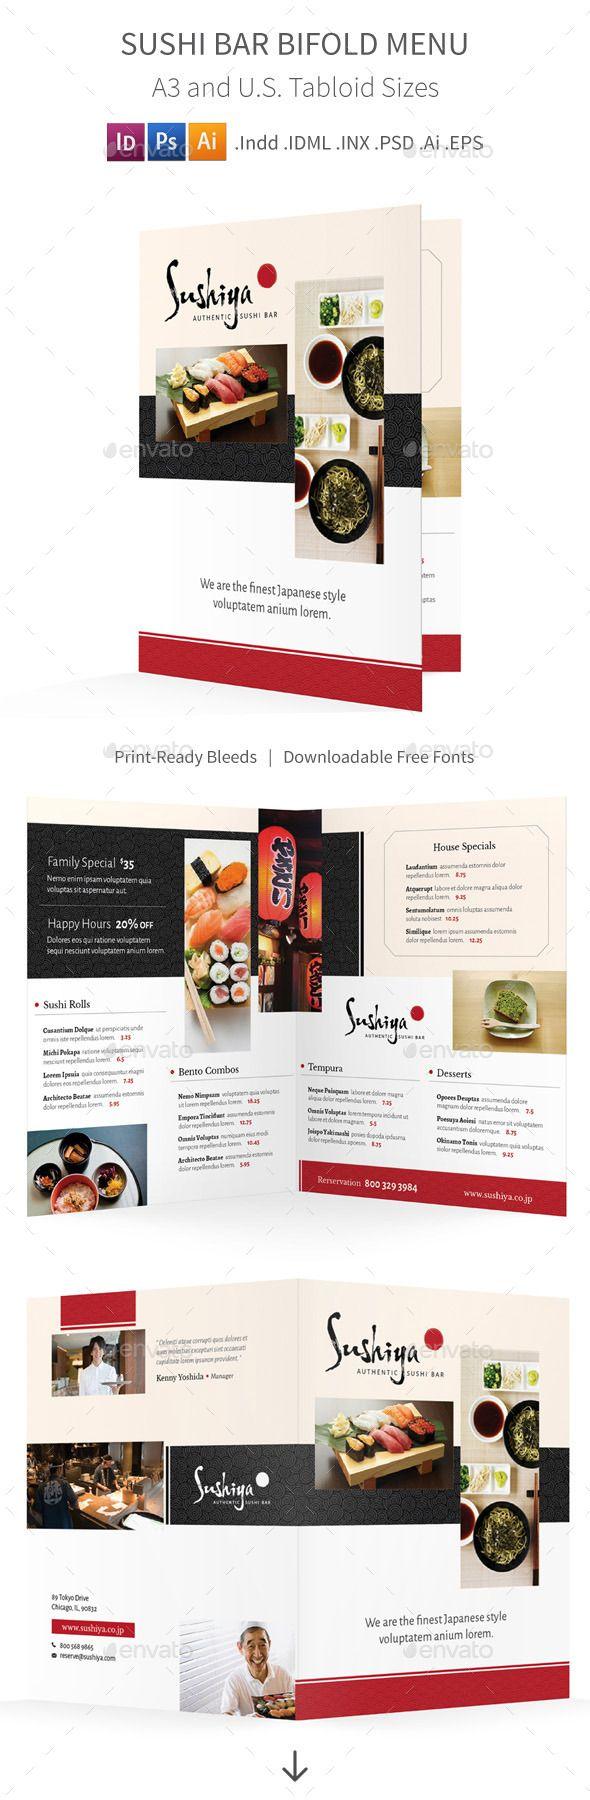 Sushi Bar Bifold / Halffold Menu Template #design Download: http://graphicriver.net/item/sushi-bar-bifold-halffold-menu/10353298?ref=ksioks